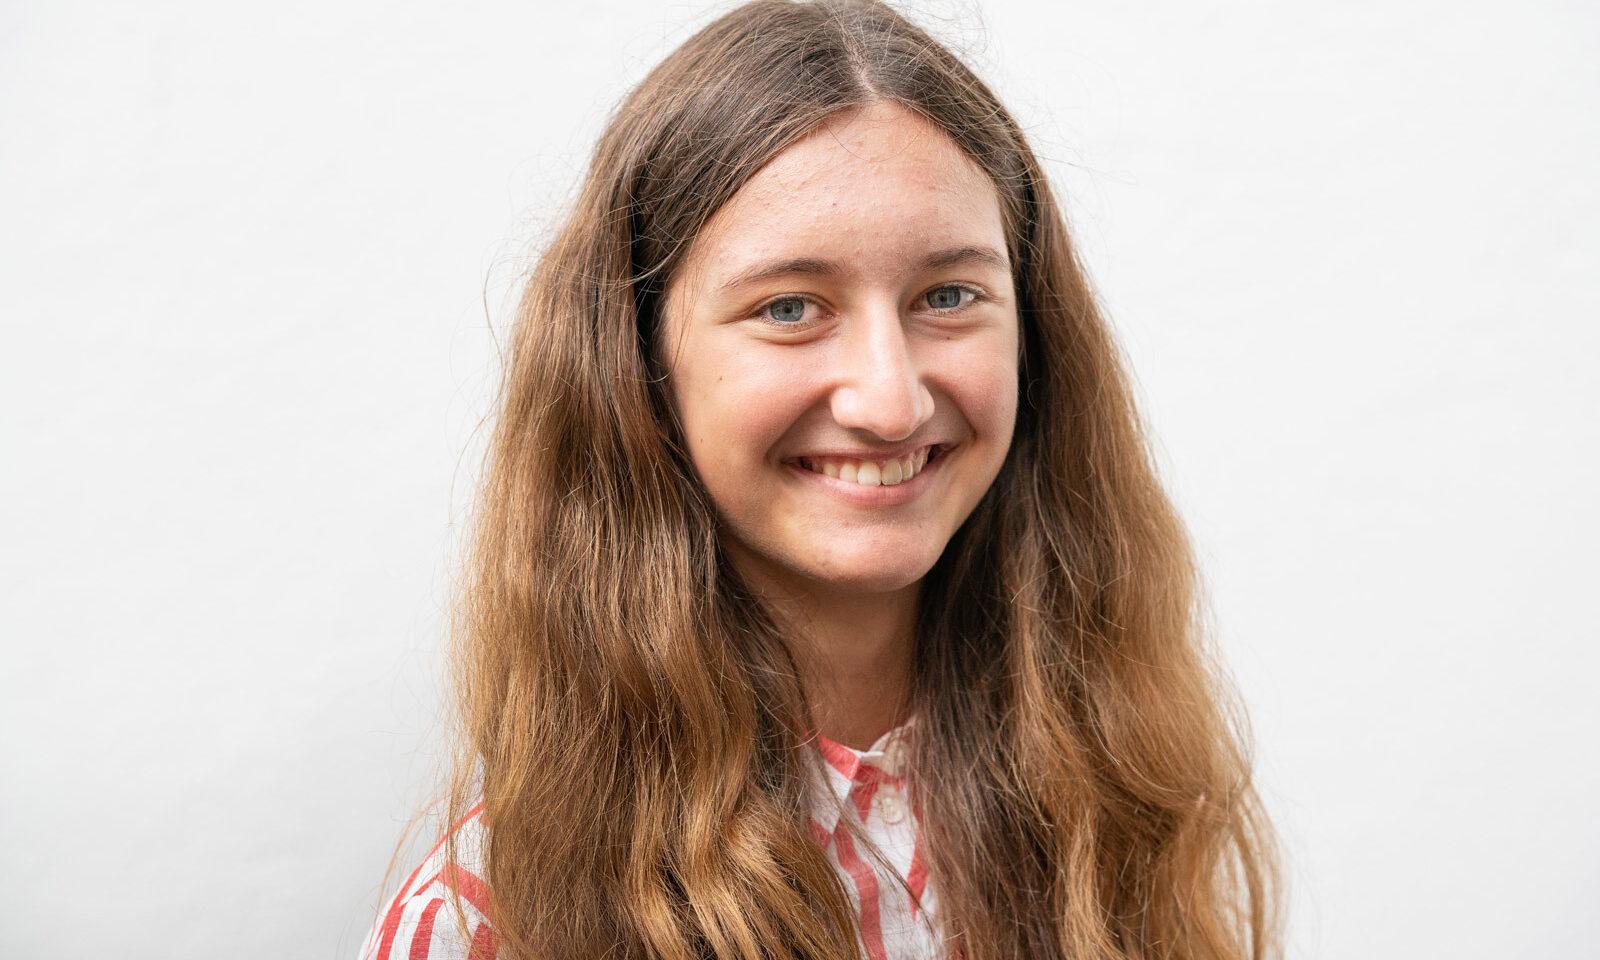 Nicole Haeberli Lernende. Nicole Häberli, Lernende Goldschmiedin, 3. Lehrjahr